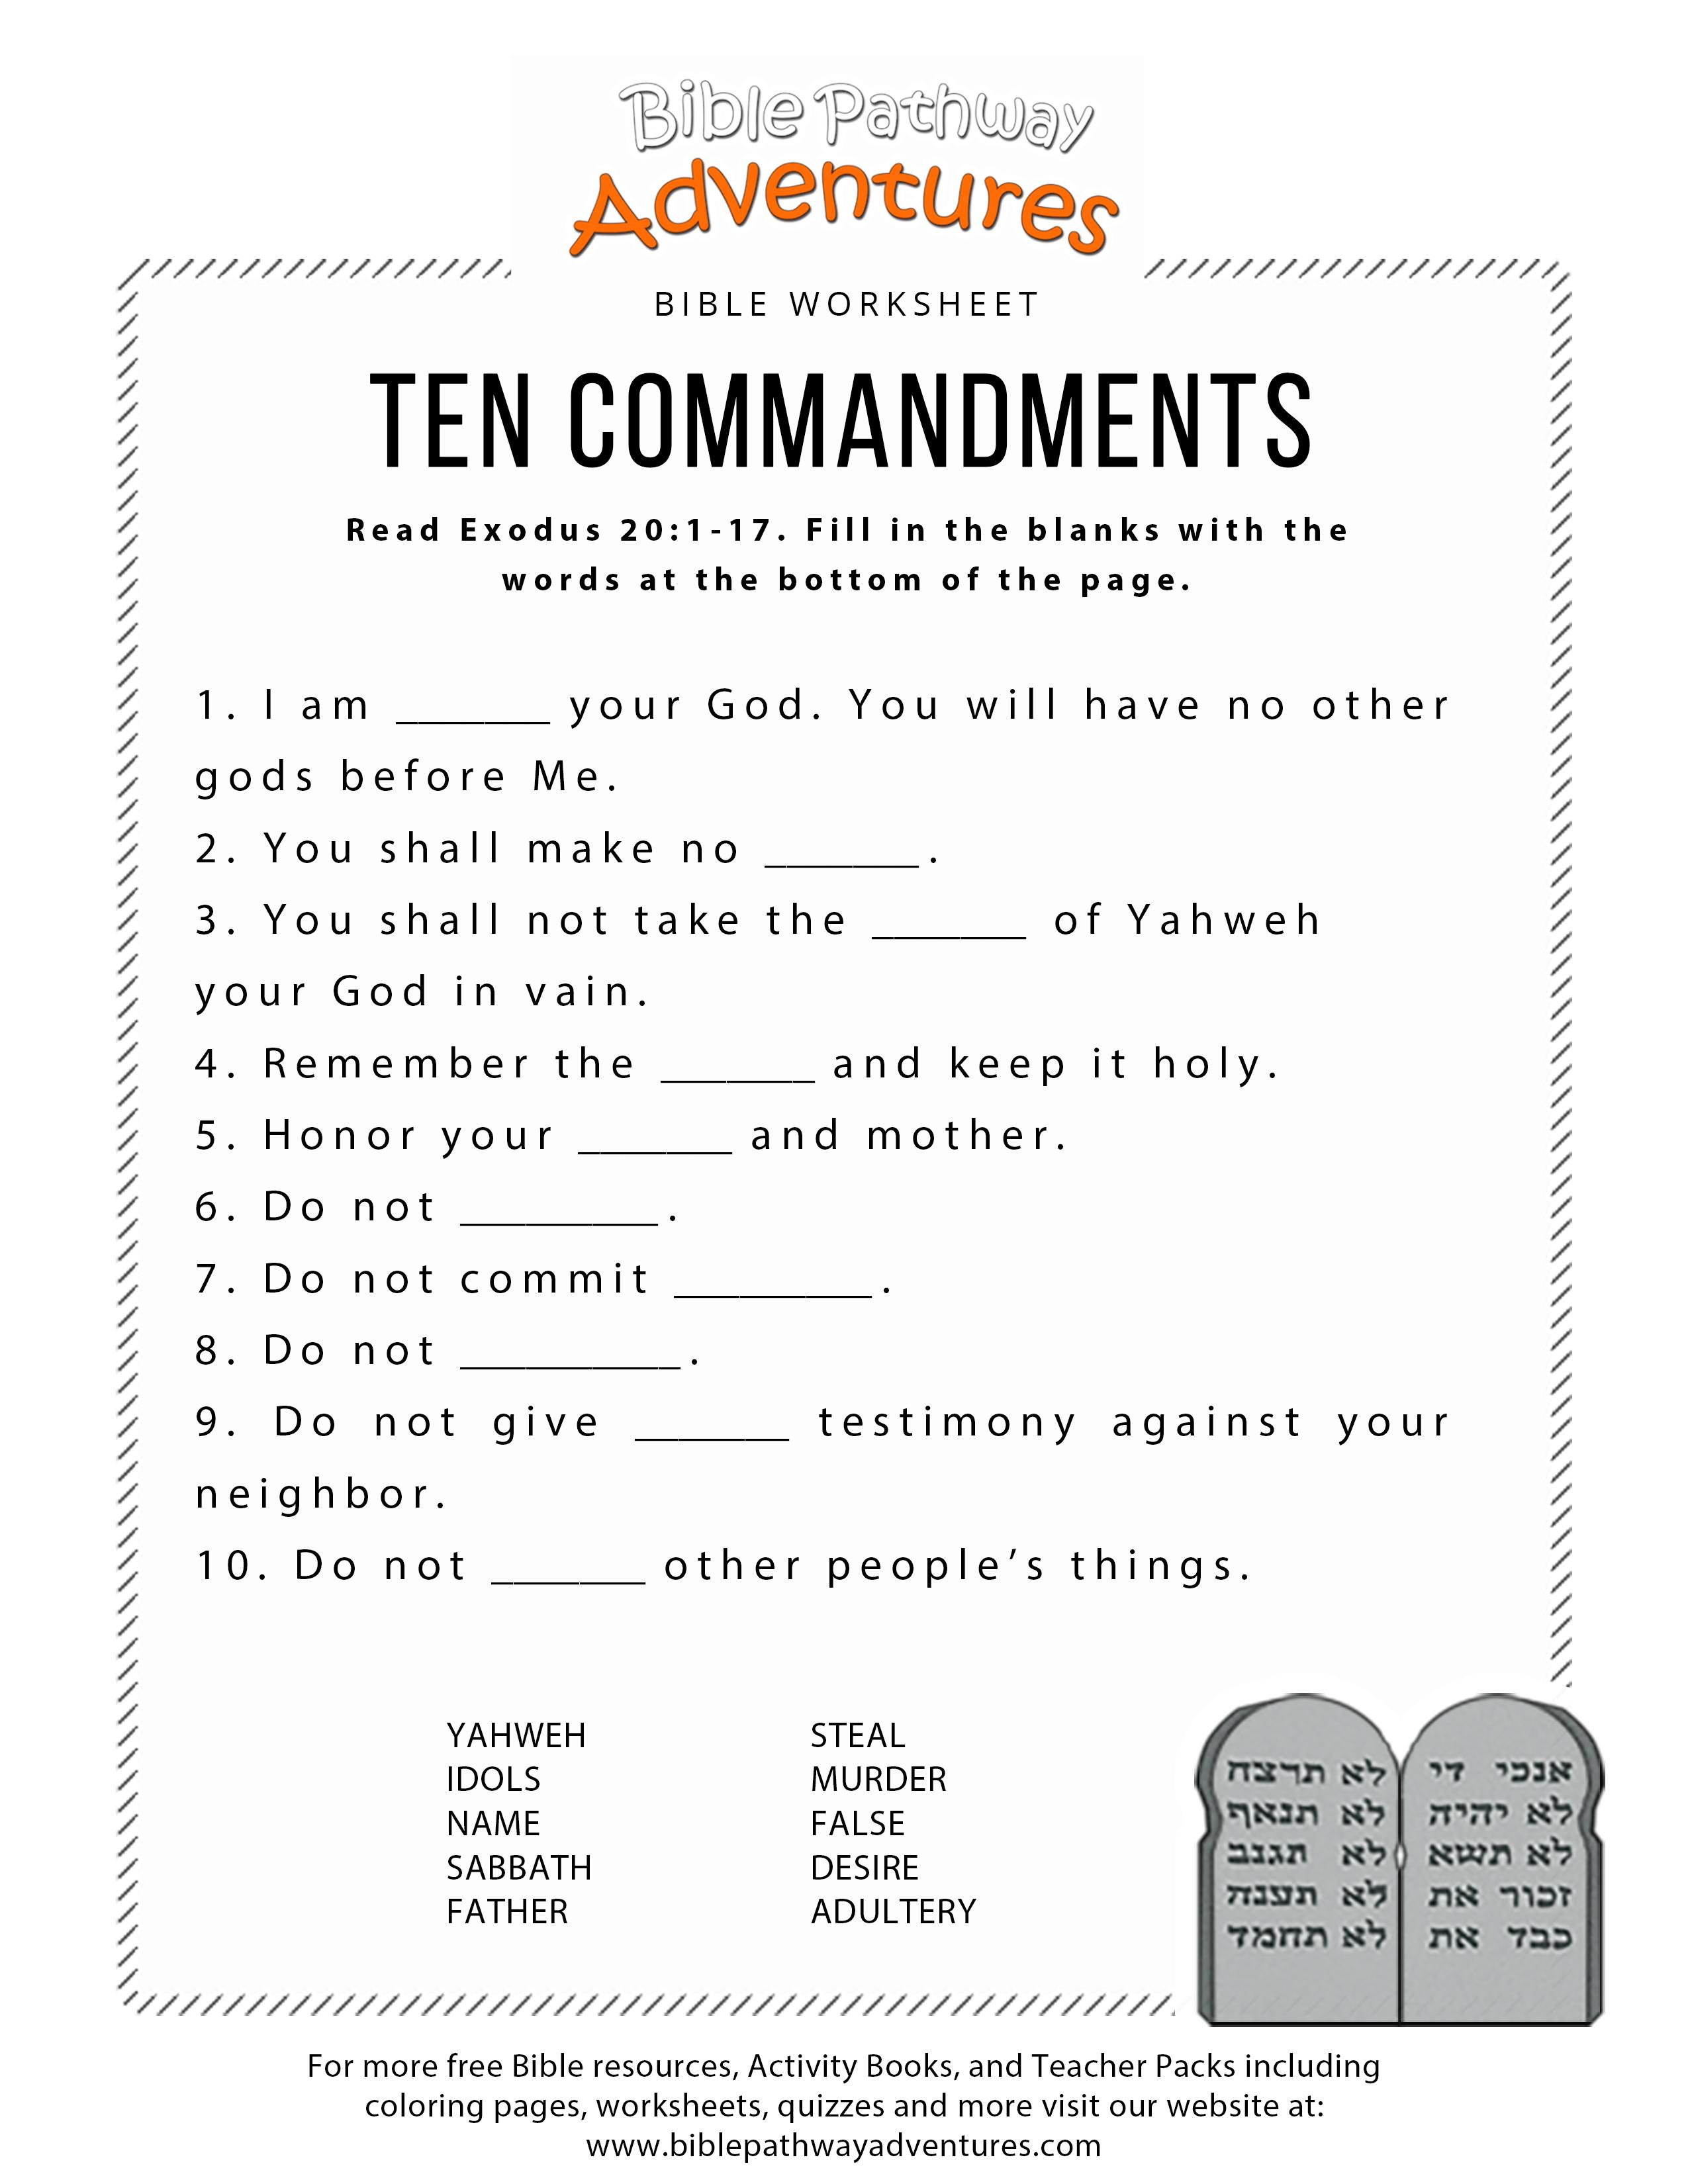 Ten Commandments Worksheet For Kids | Worksheets For Psr | Bible - Free Catholic Ten Commandments Printable